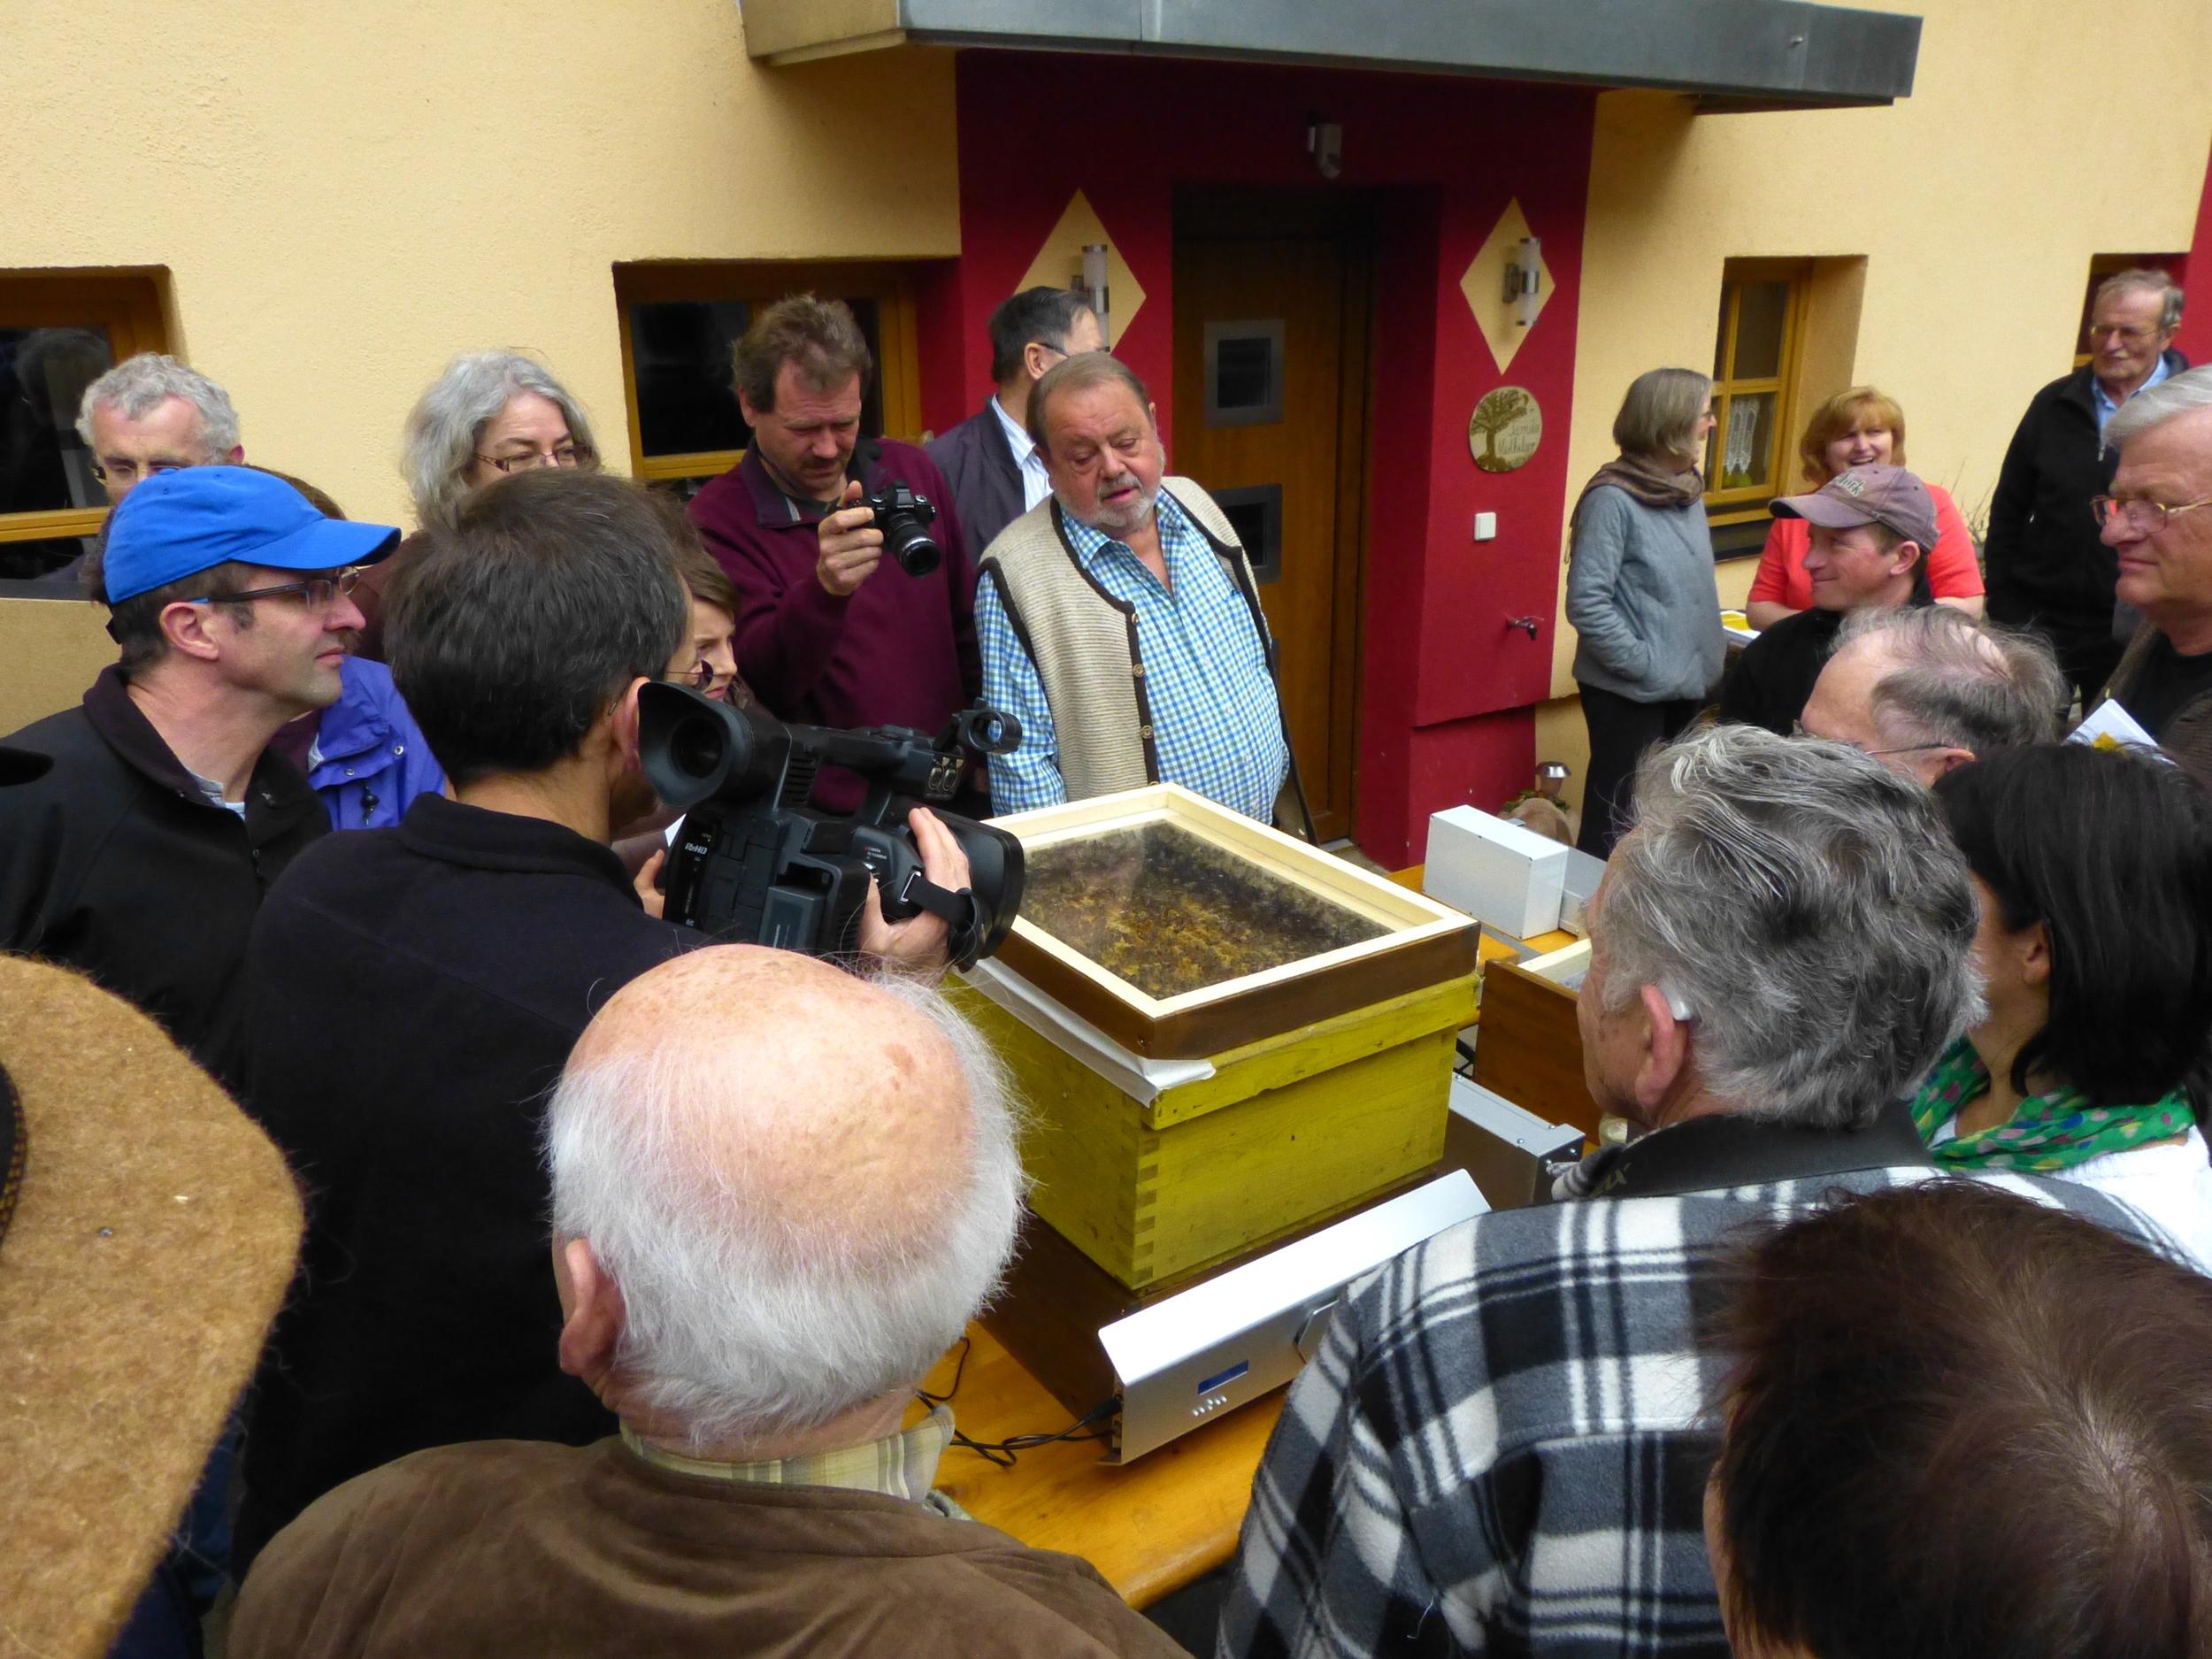 Bienensauna-Behandlung in Oberbergkirchen